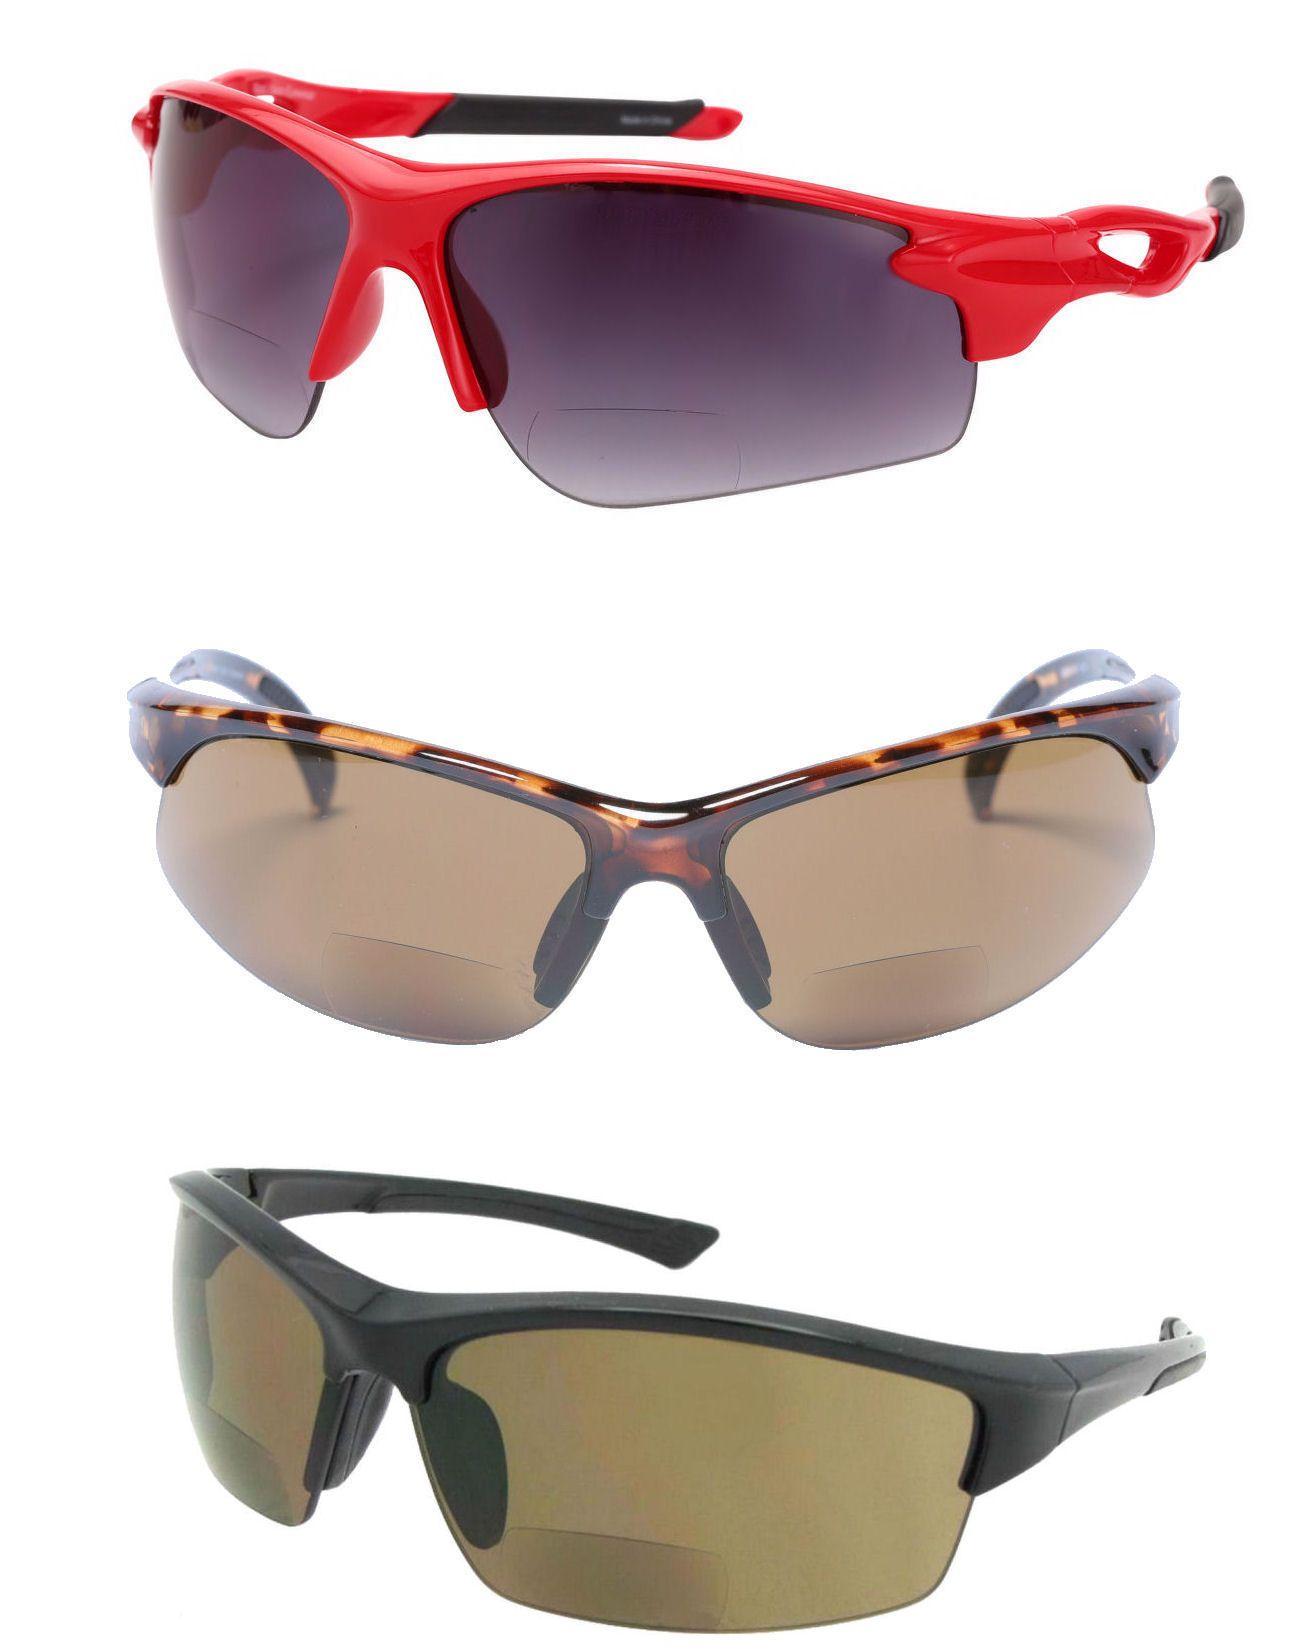 Ryders Bison R853001 Polarized Wrap Sunglasses, Black, 55